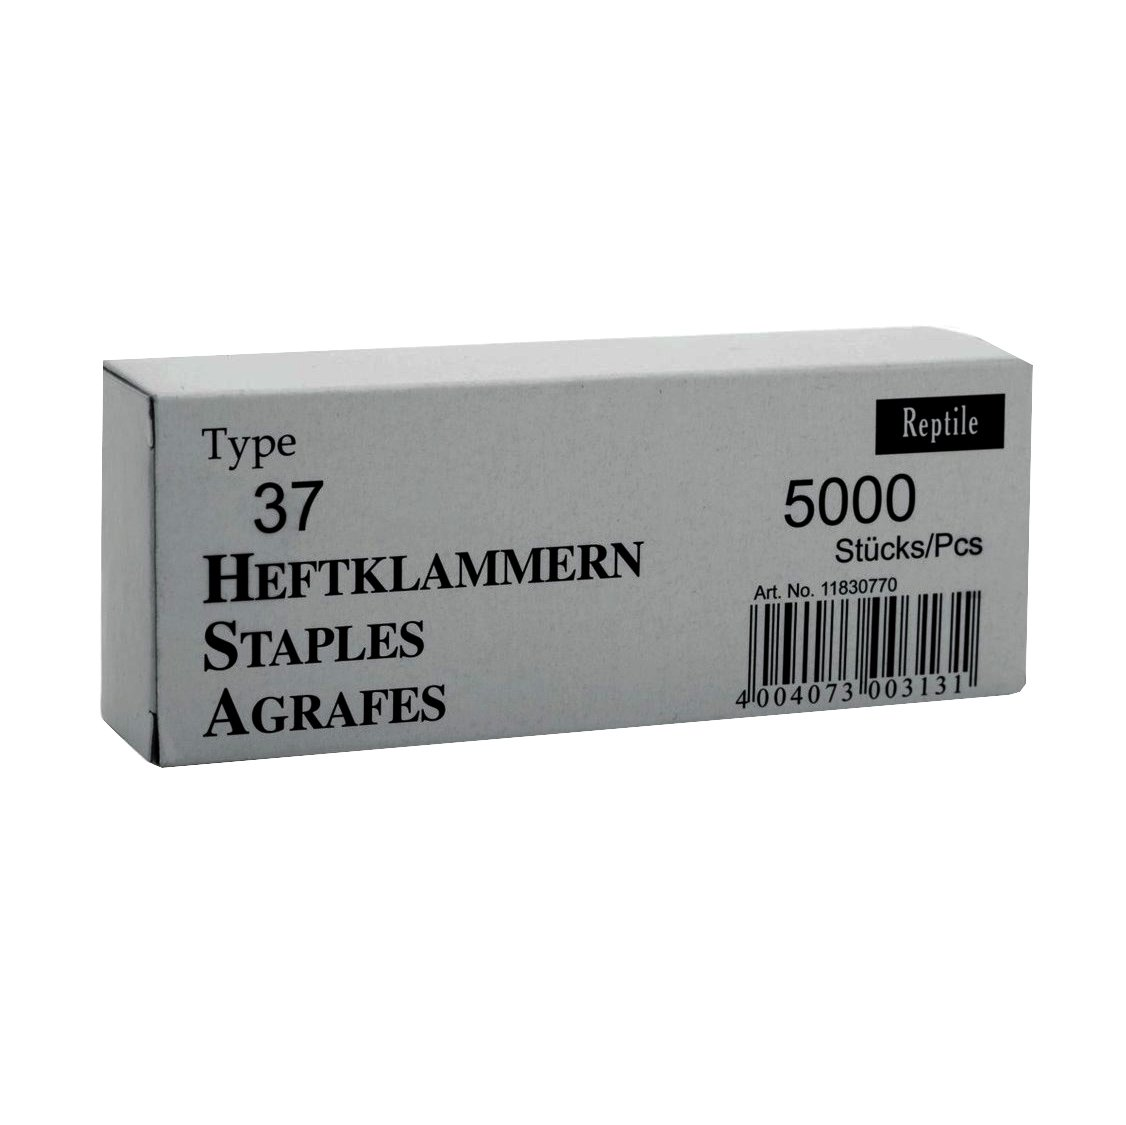 Isaberg 7693490006 - Clip calidad industrial 11830770